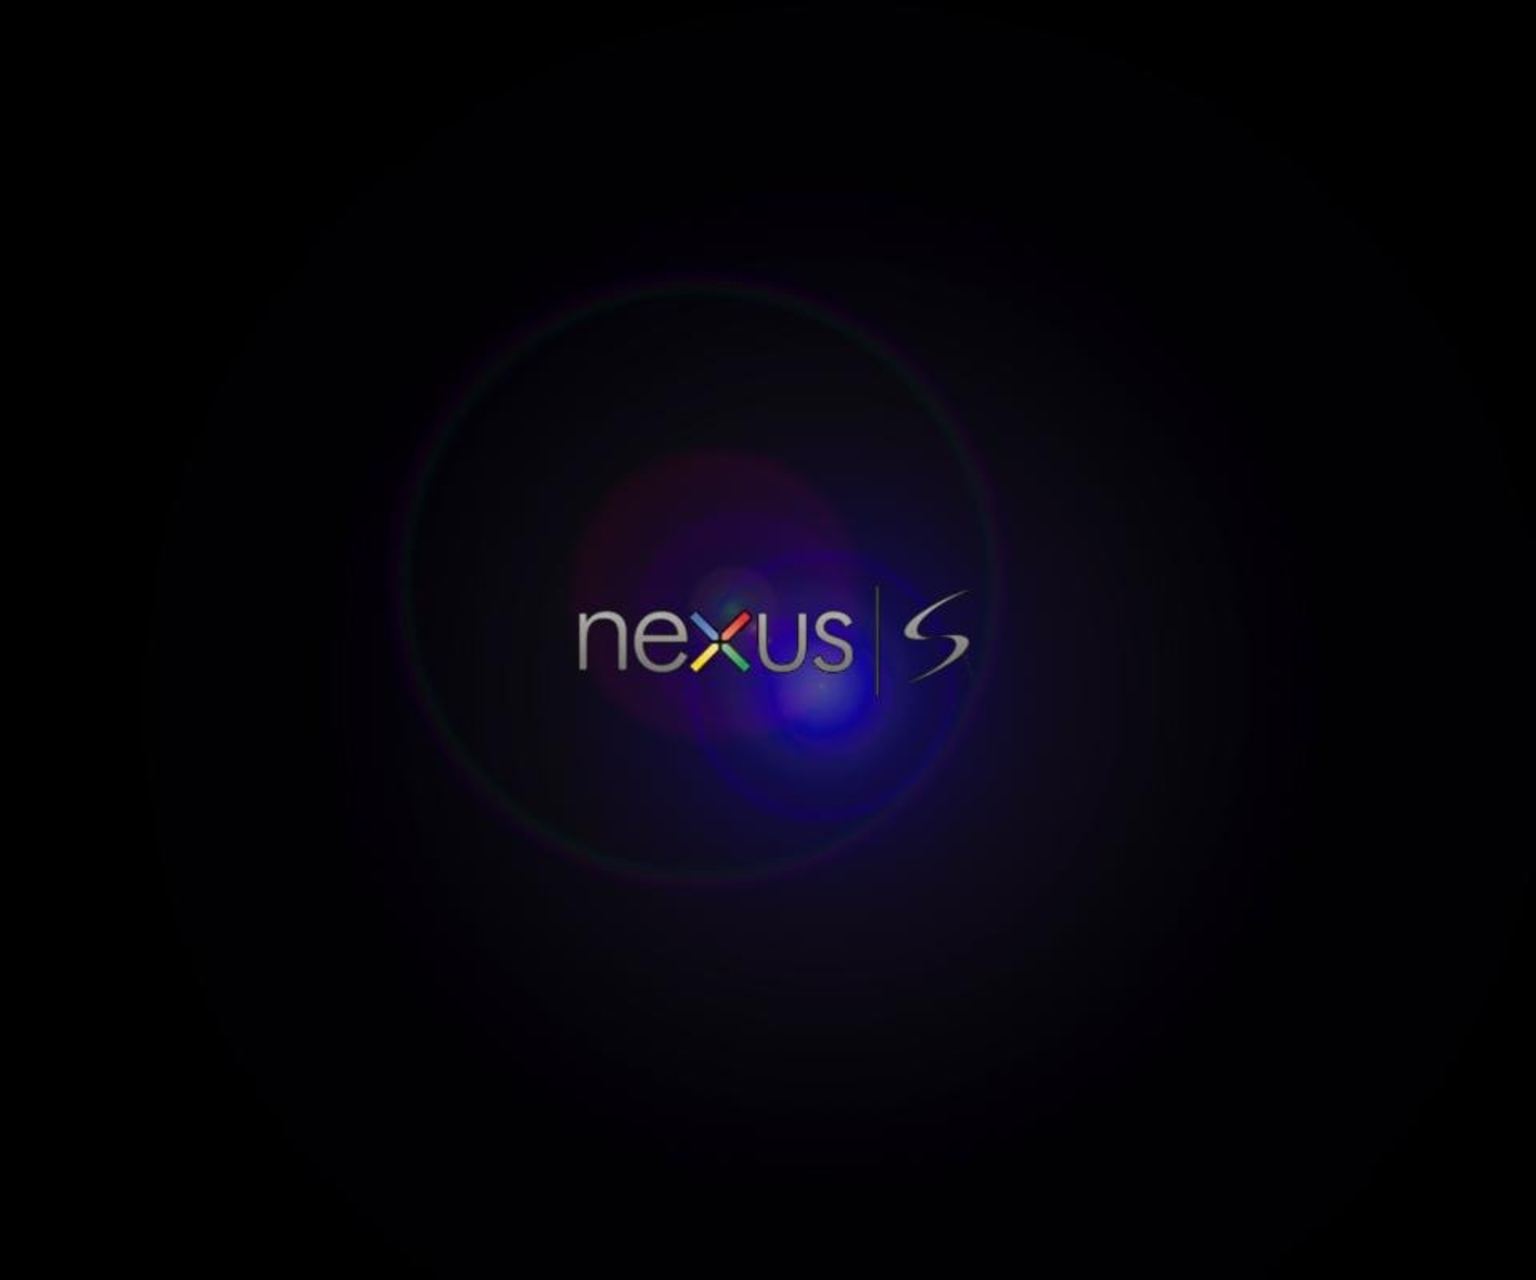 Nexus Wallpaper Hd